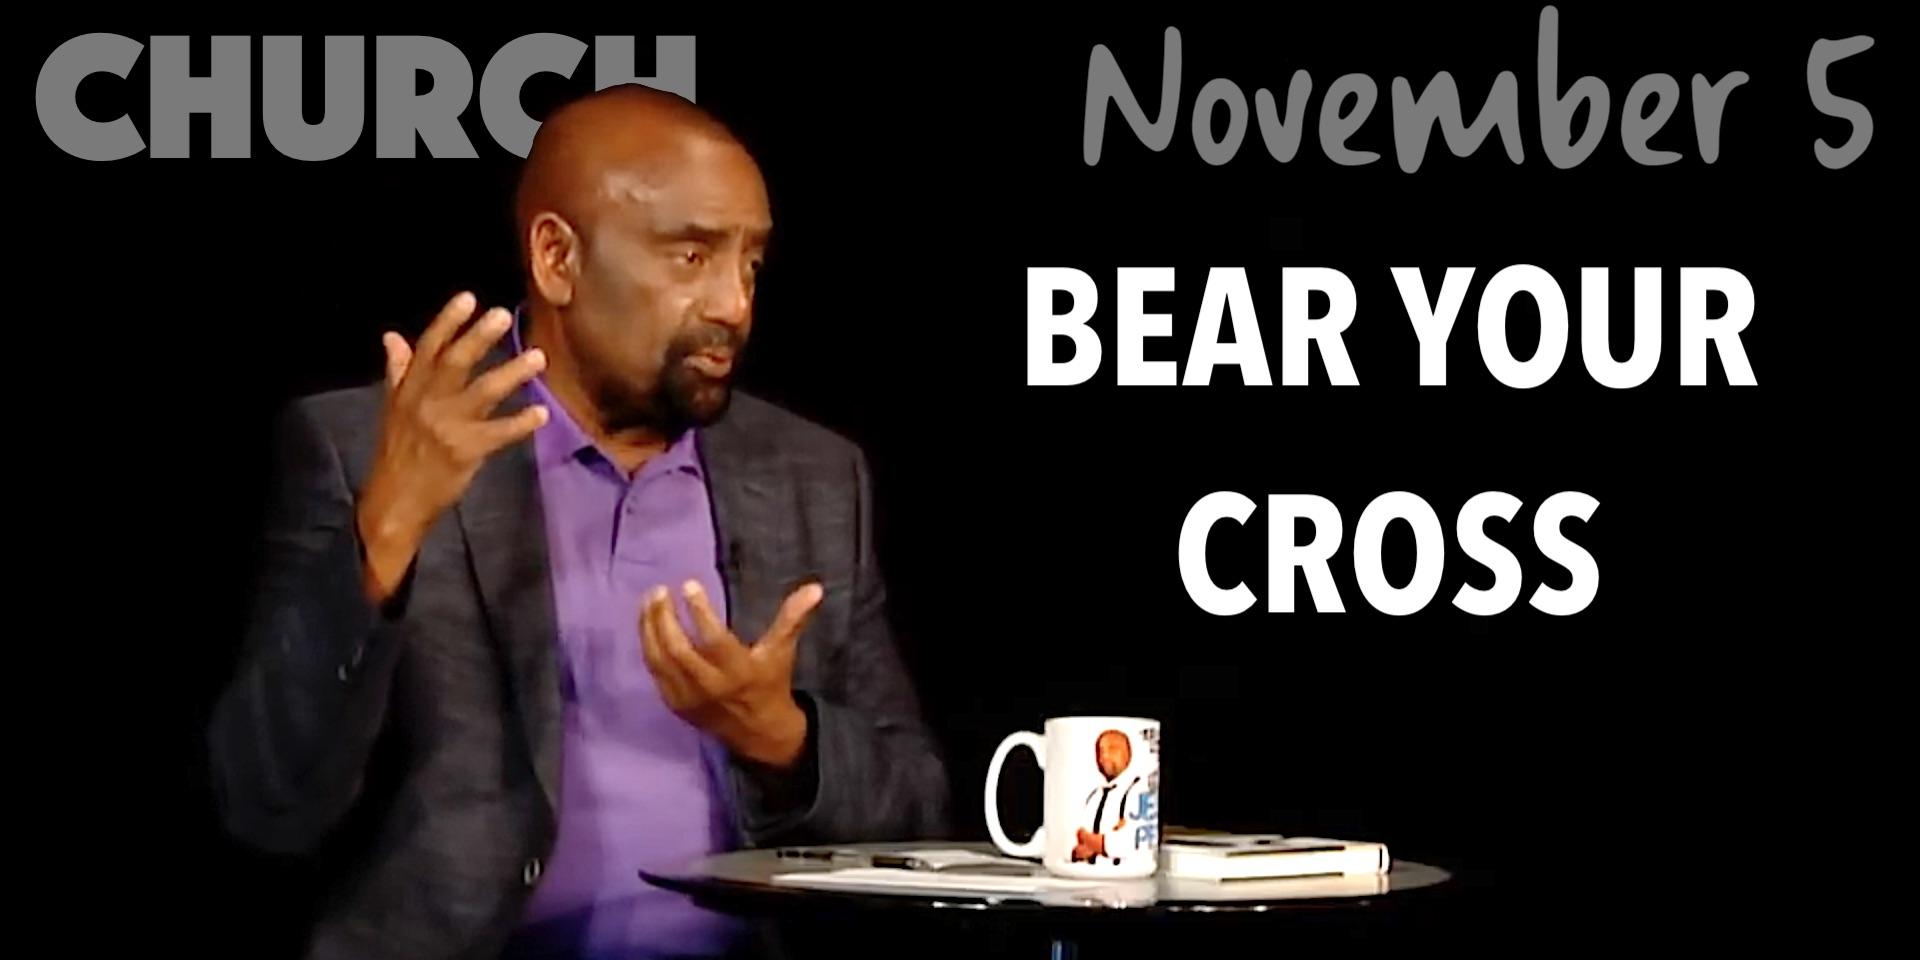 Church Nov 5, 2017: Bear Your Cross